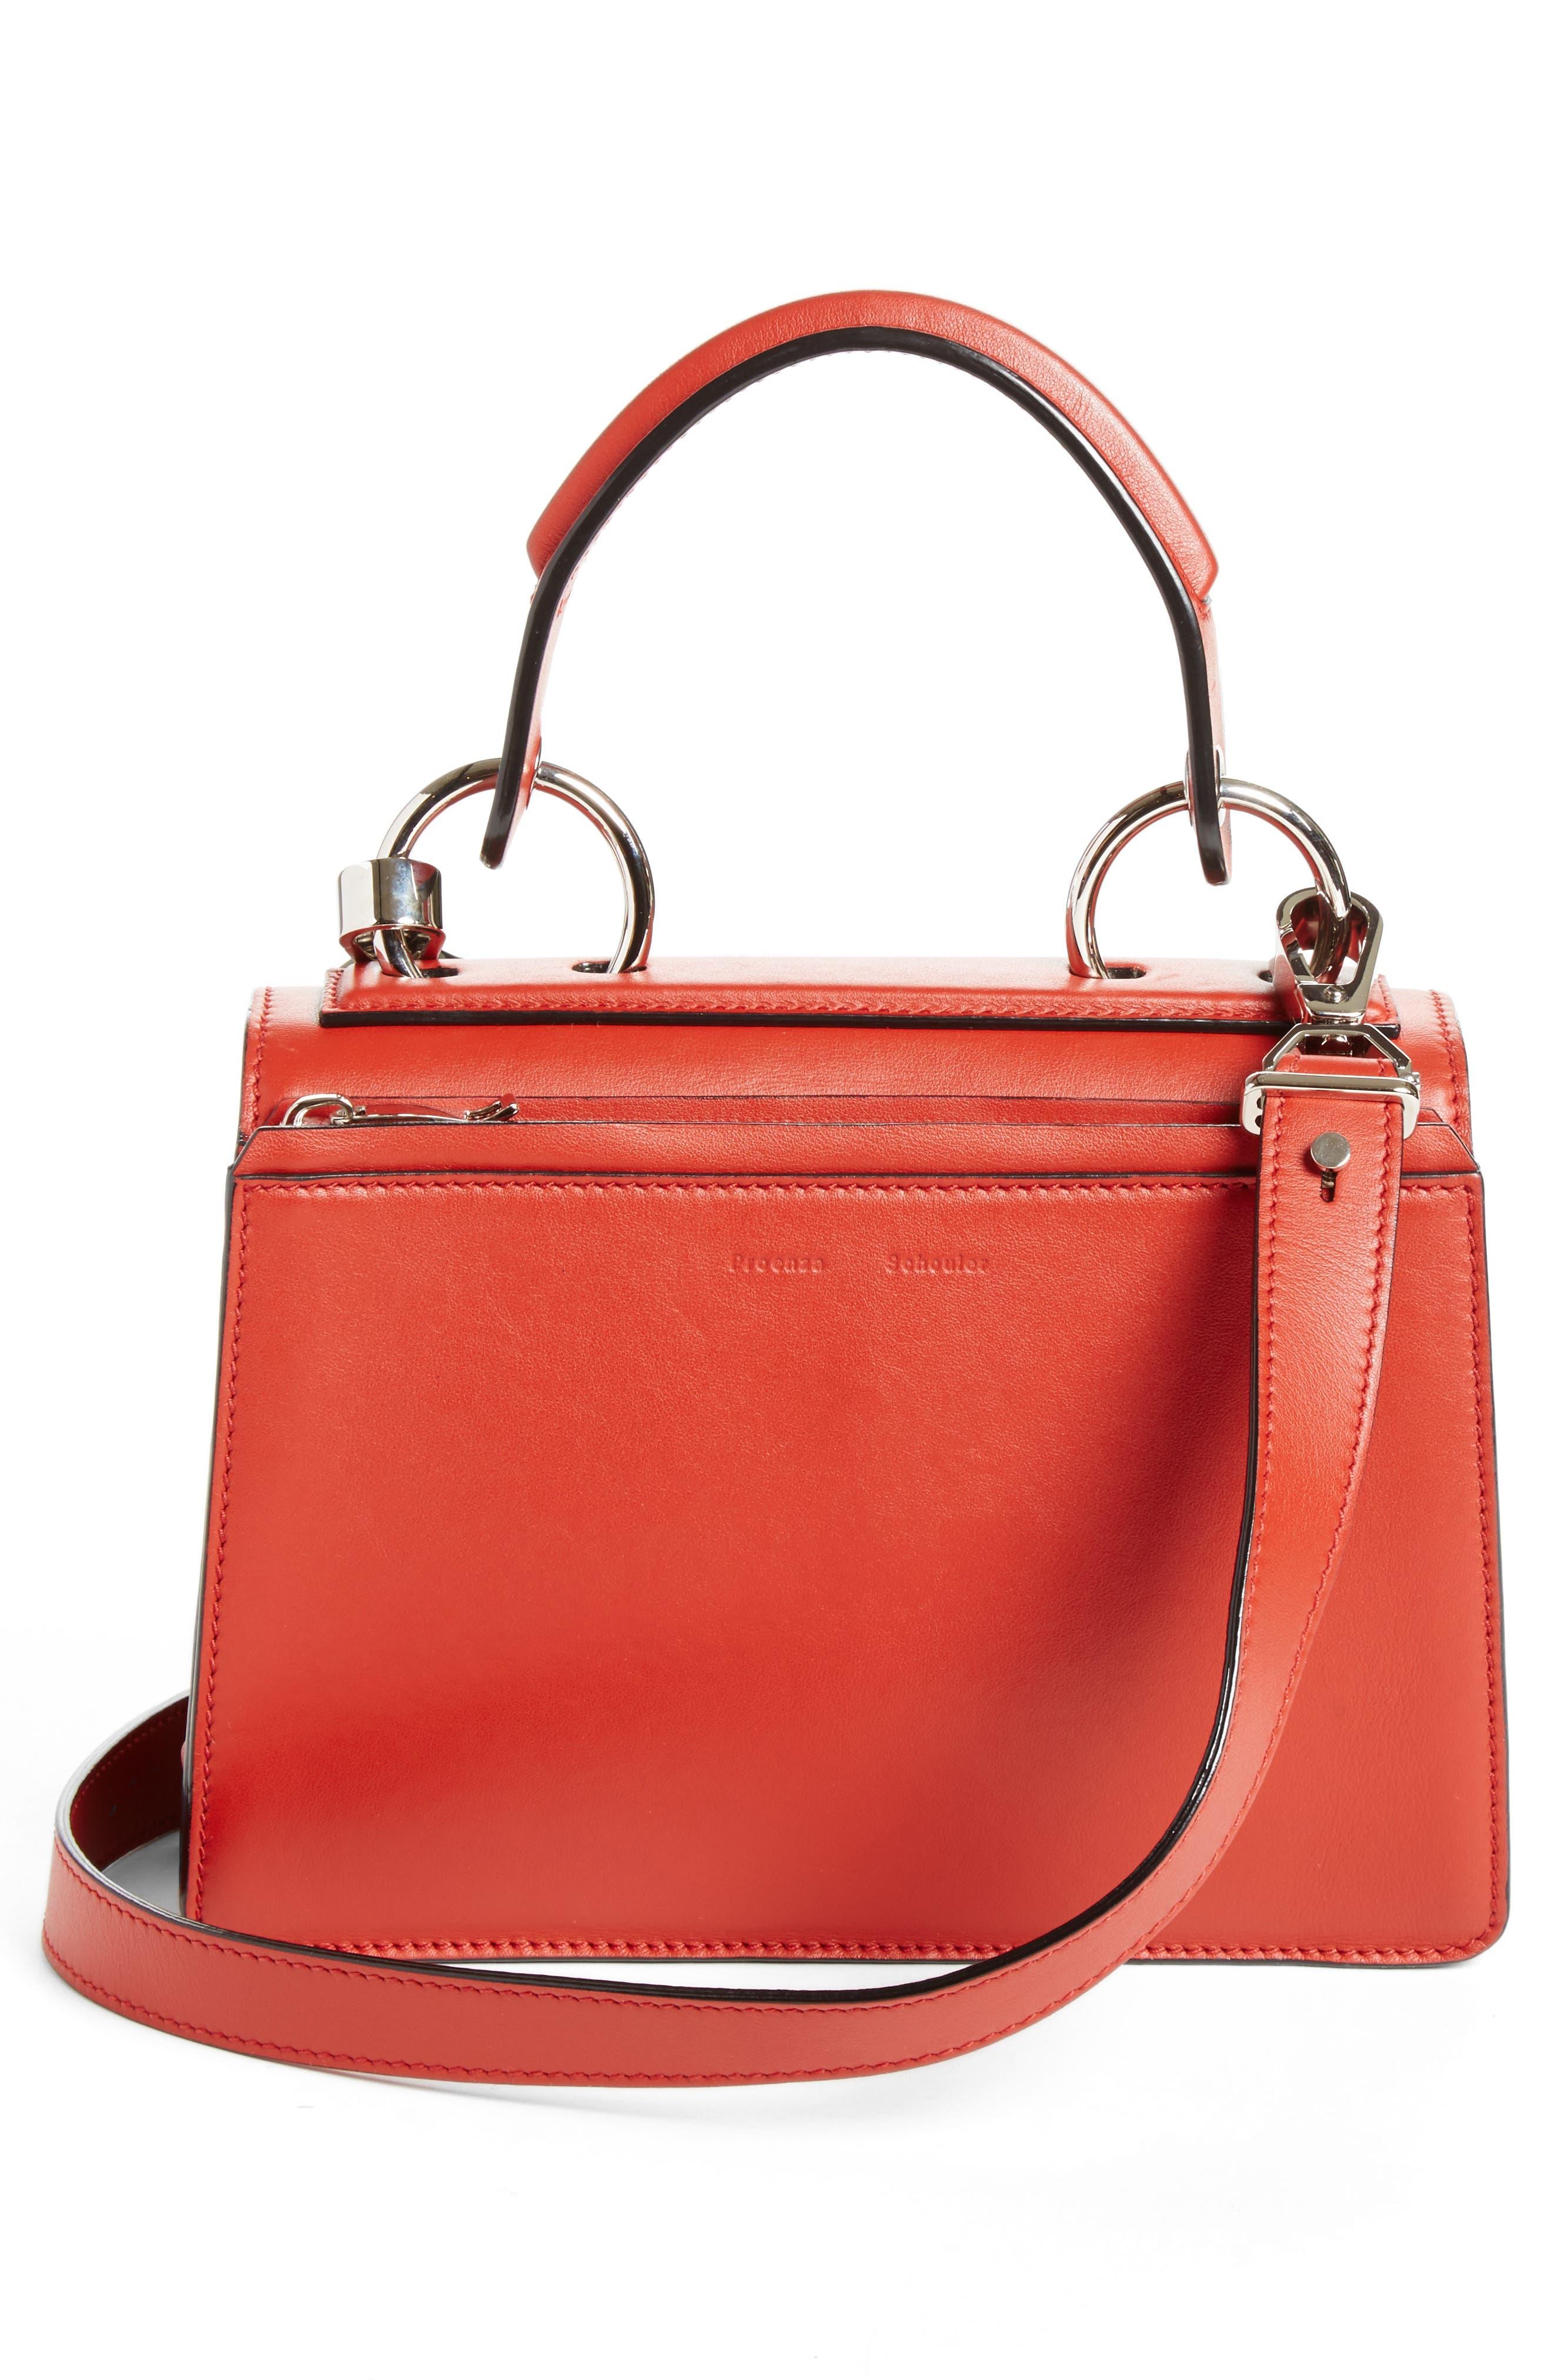 'Small Hava' Top Handle Calfskin Leather Satchel,                             Alternate thumbnail 2, color,                             Brick